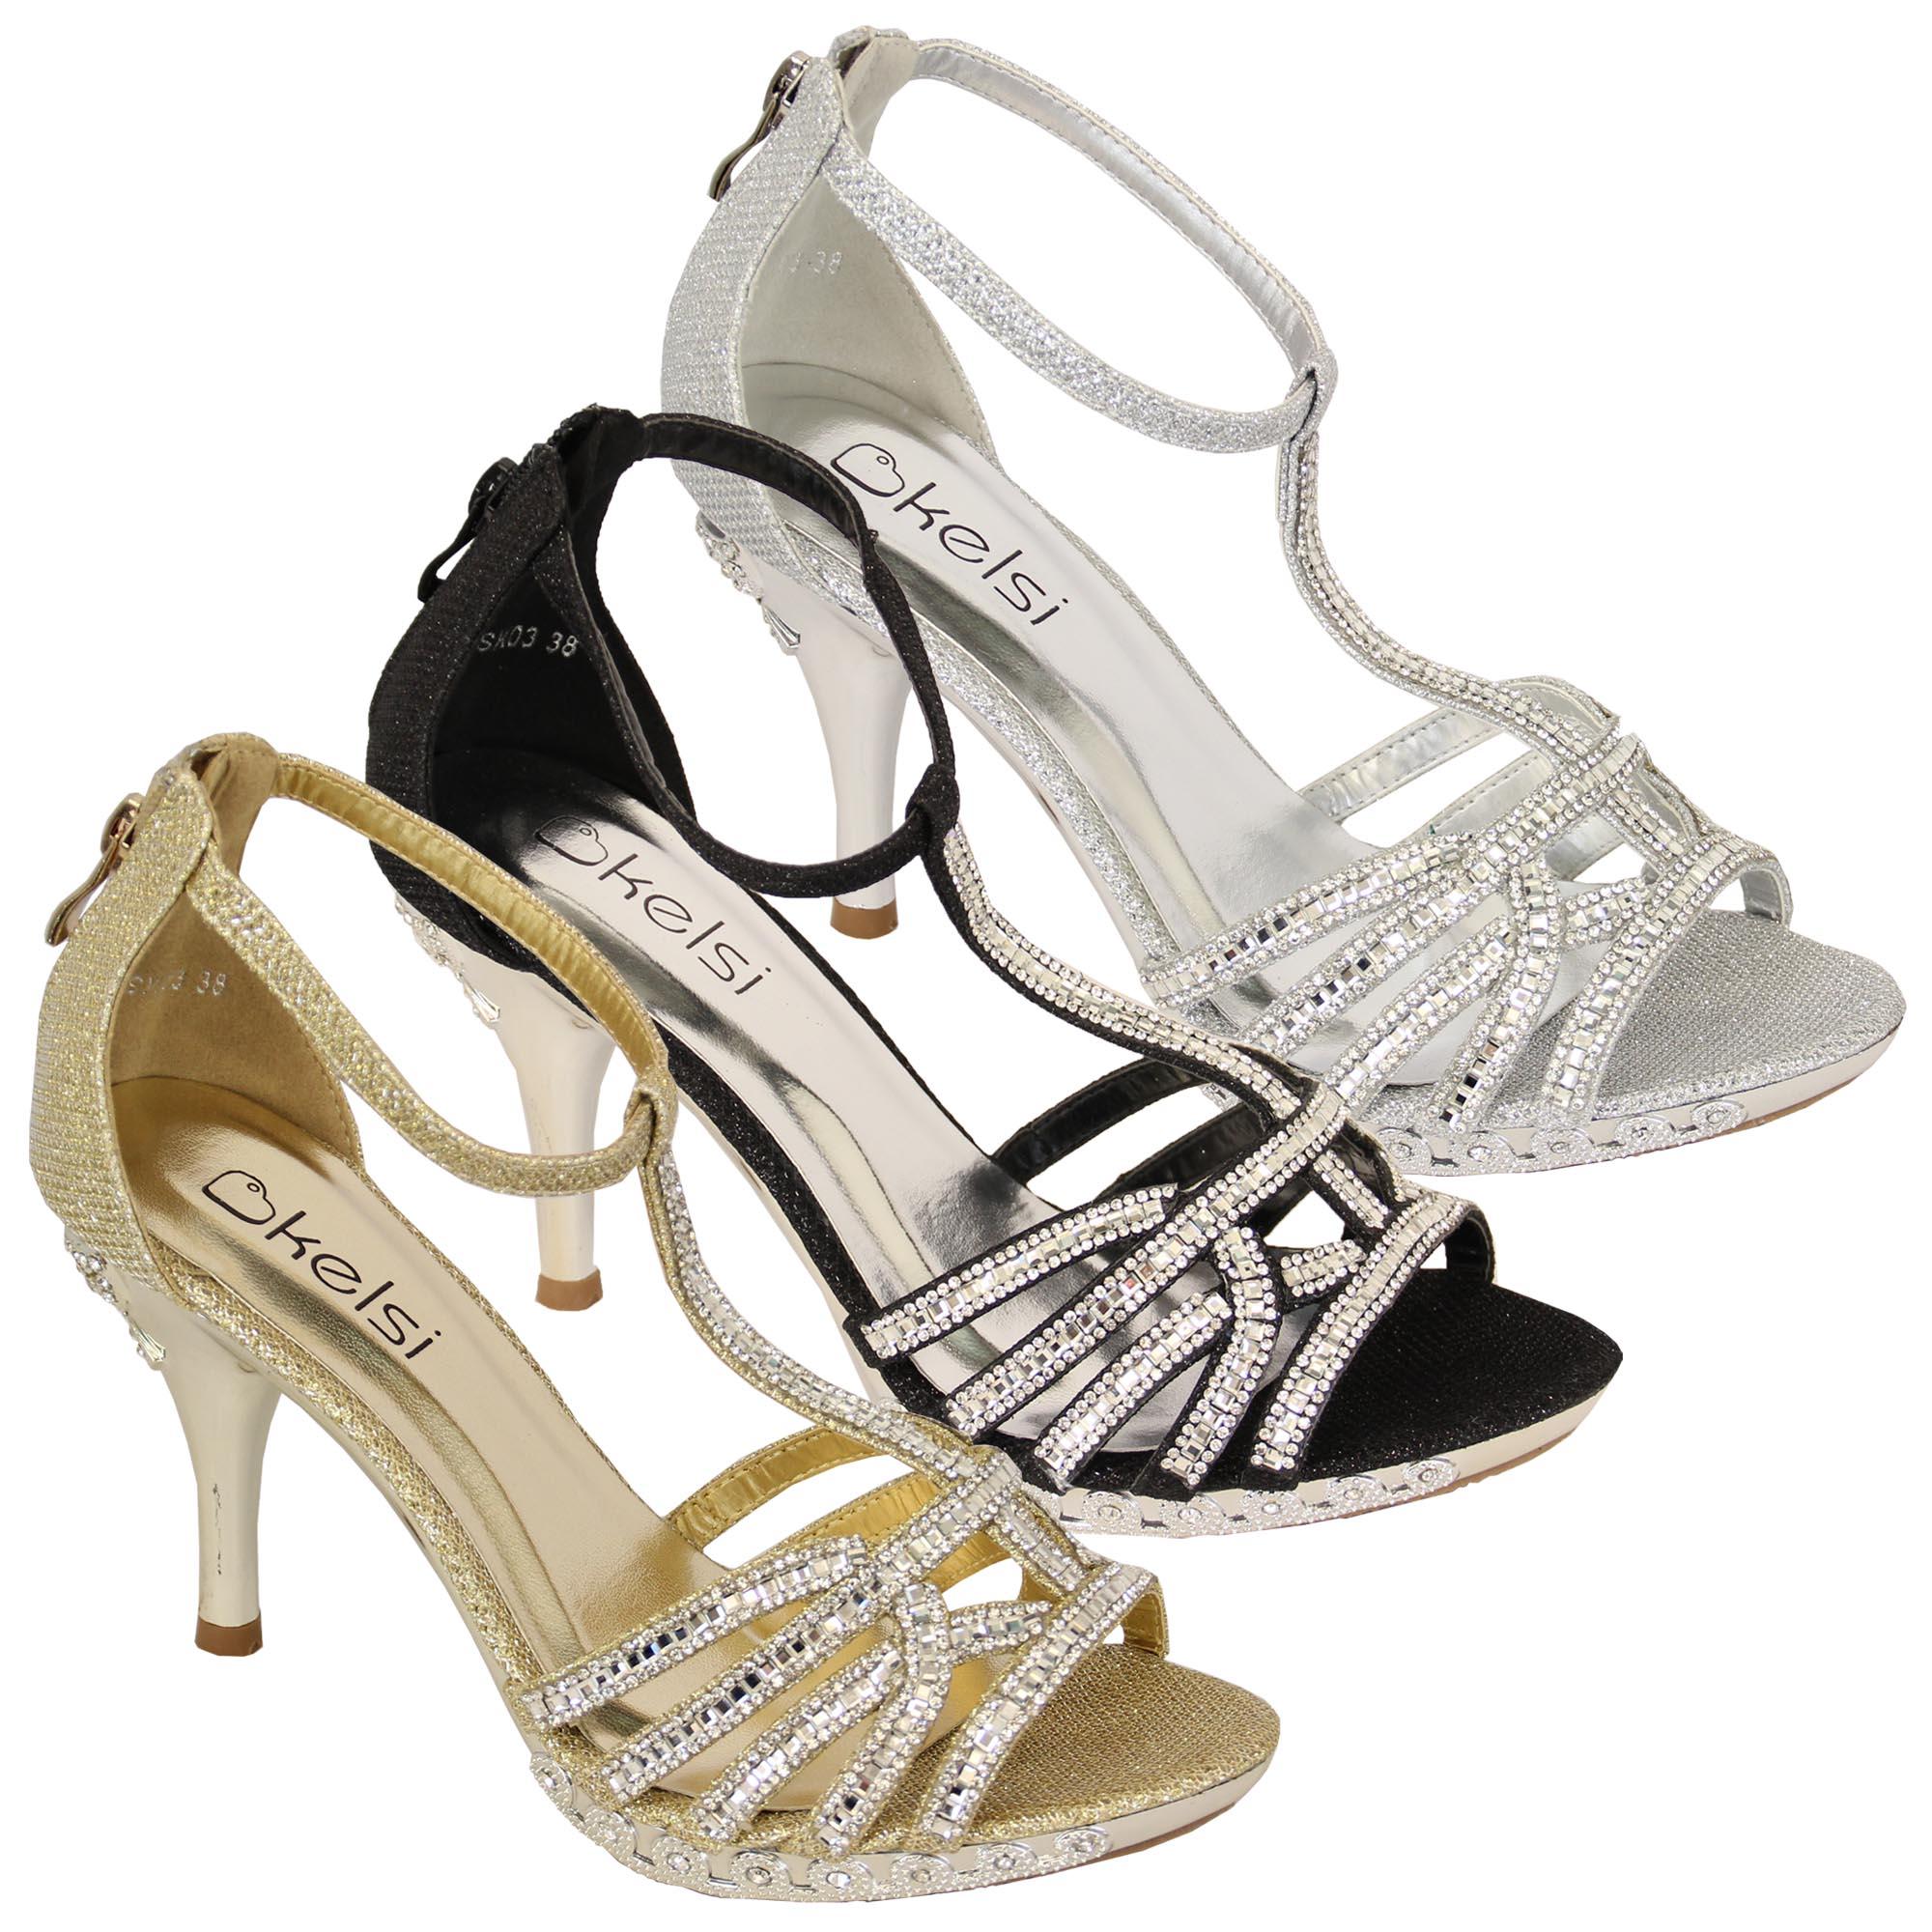 5b51107676768c Details about ladies diamante high pencil heel sandals by Kelsi Shoes